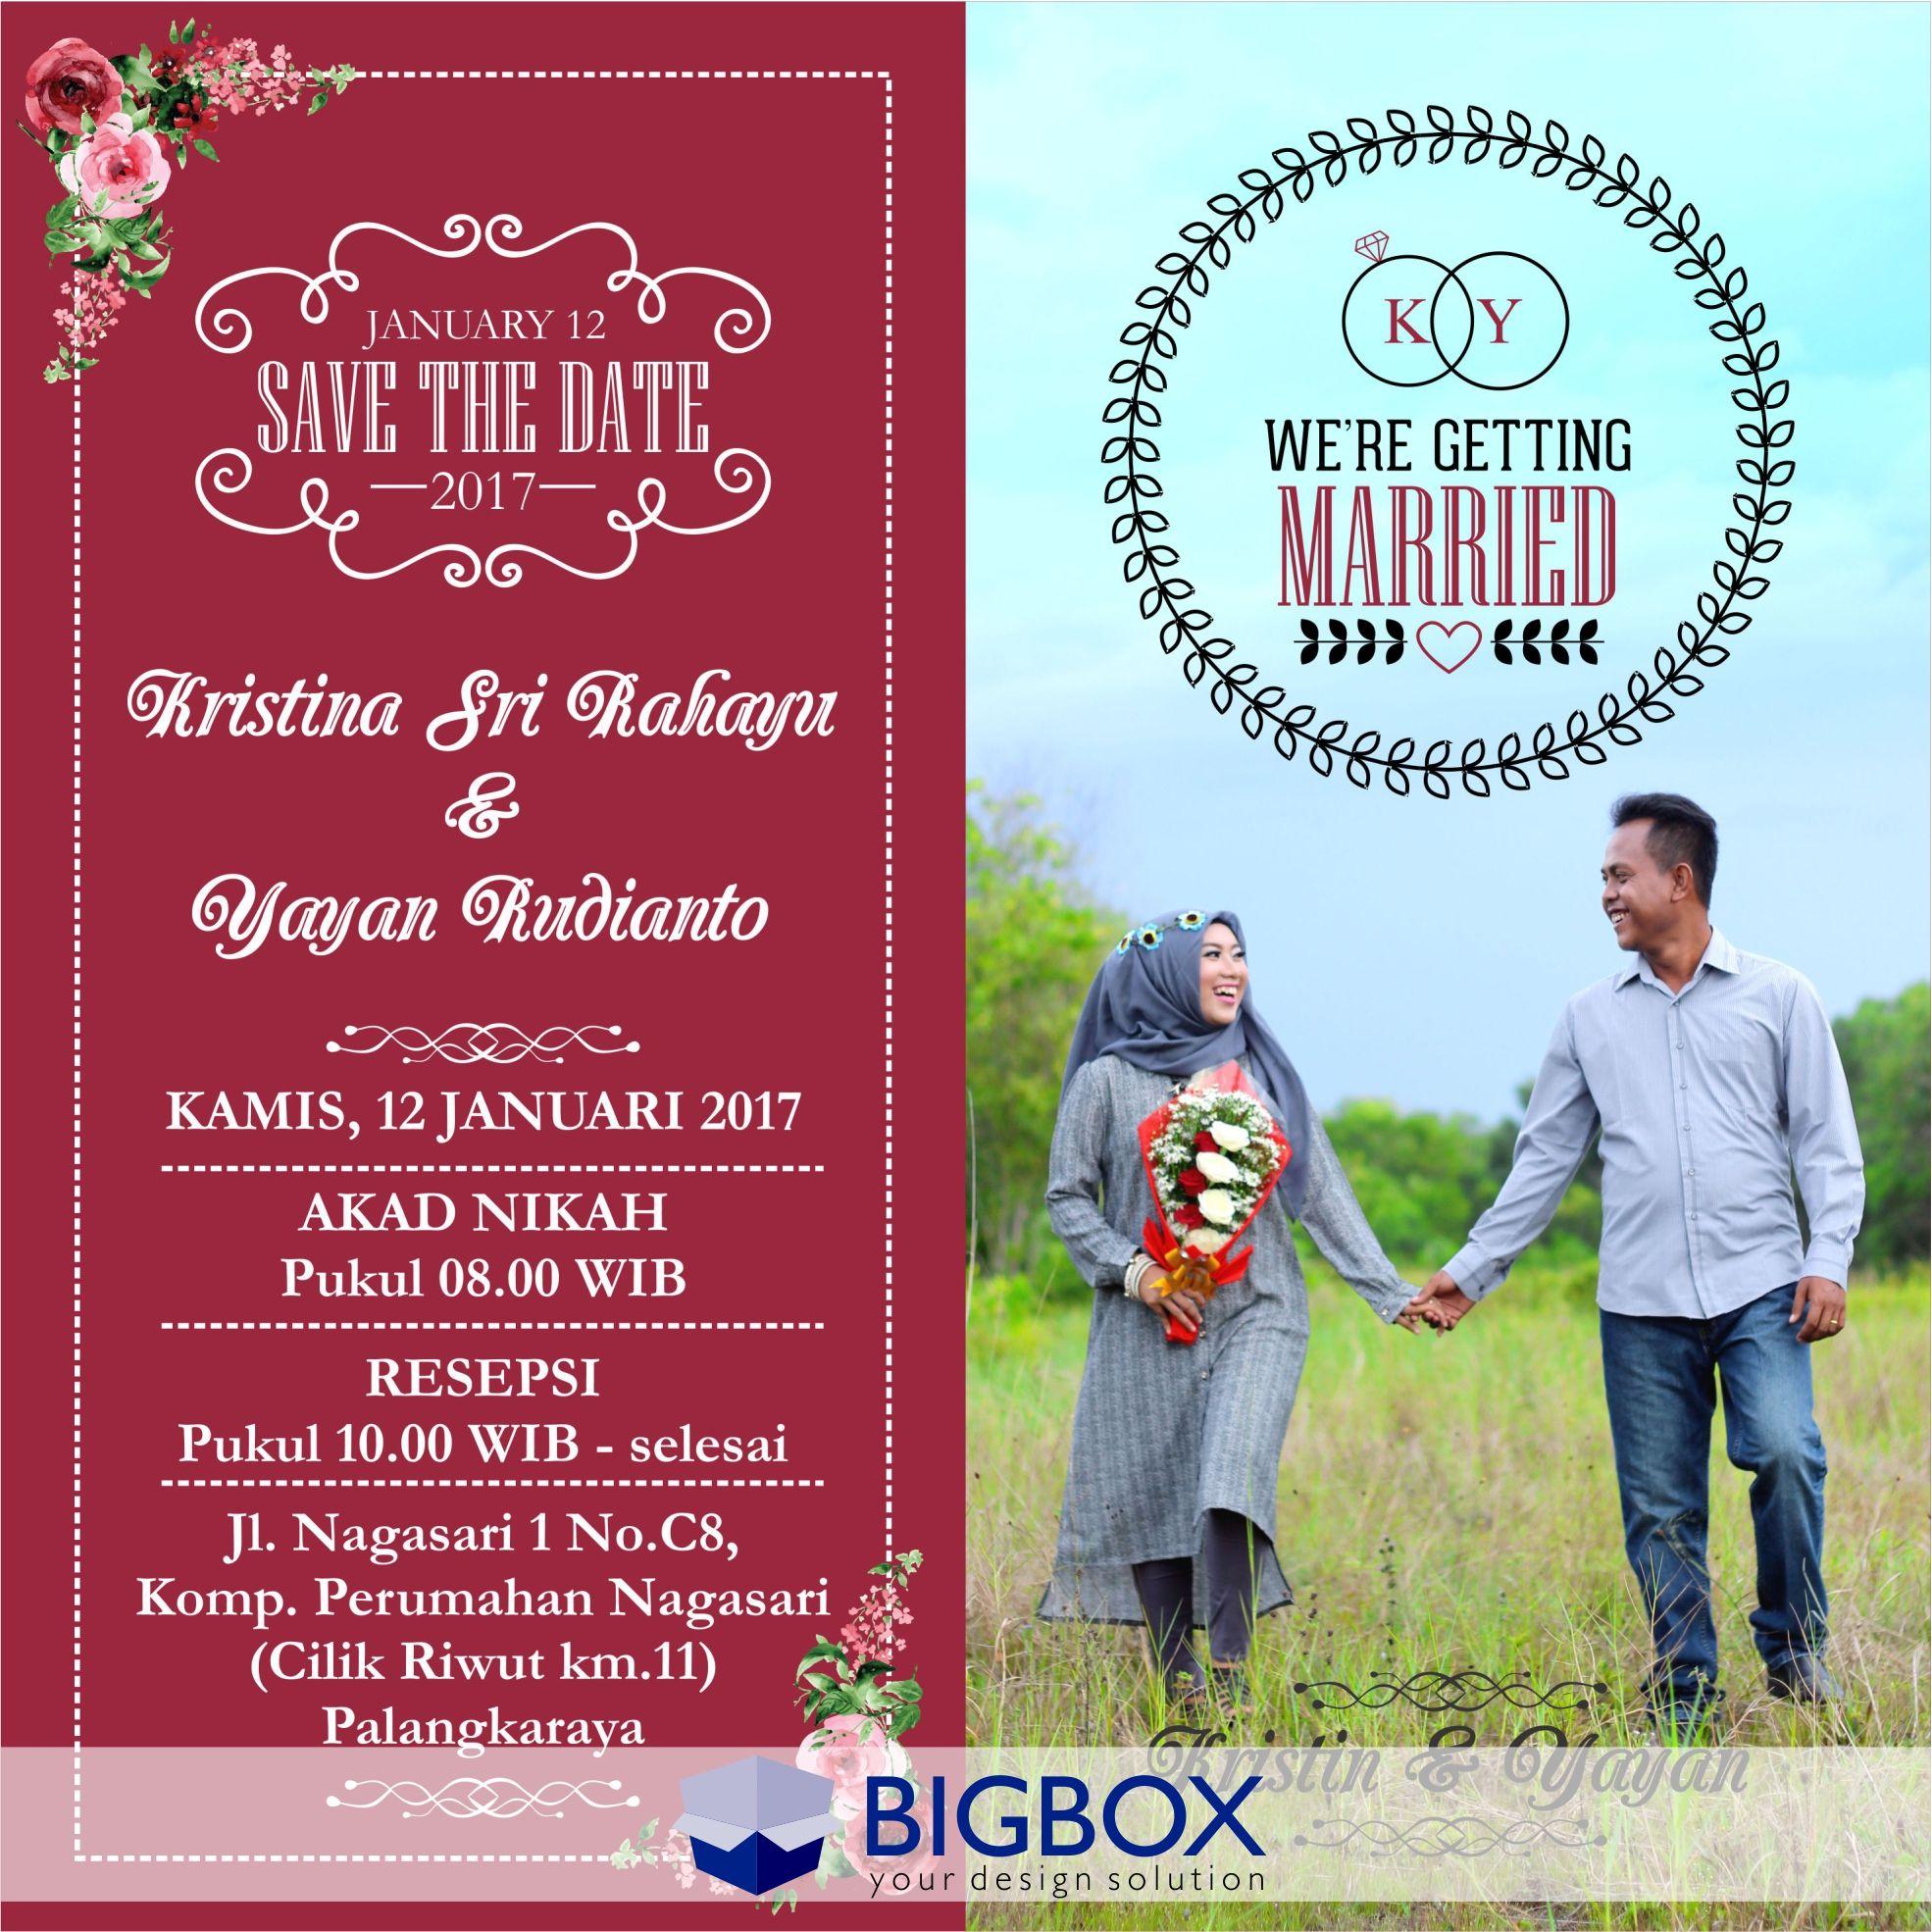 Pin by Aldila Putri on Wedding Digital Invitation   Pinterest